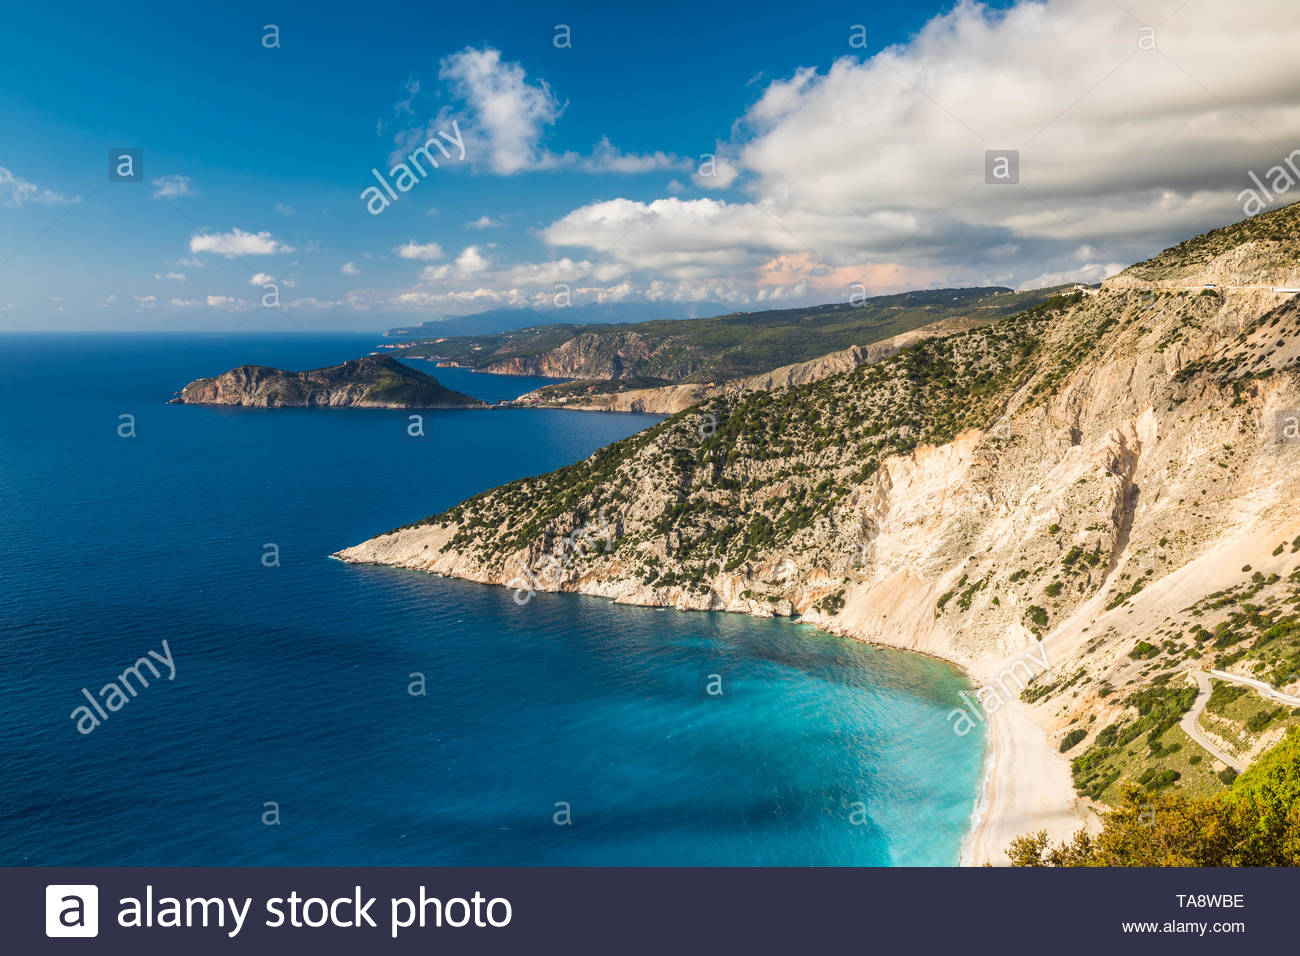 Myrtos Beach in Kefalonia, Ionian Islands, Greece - Stock Image